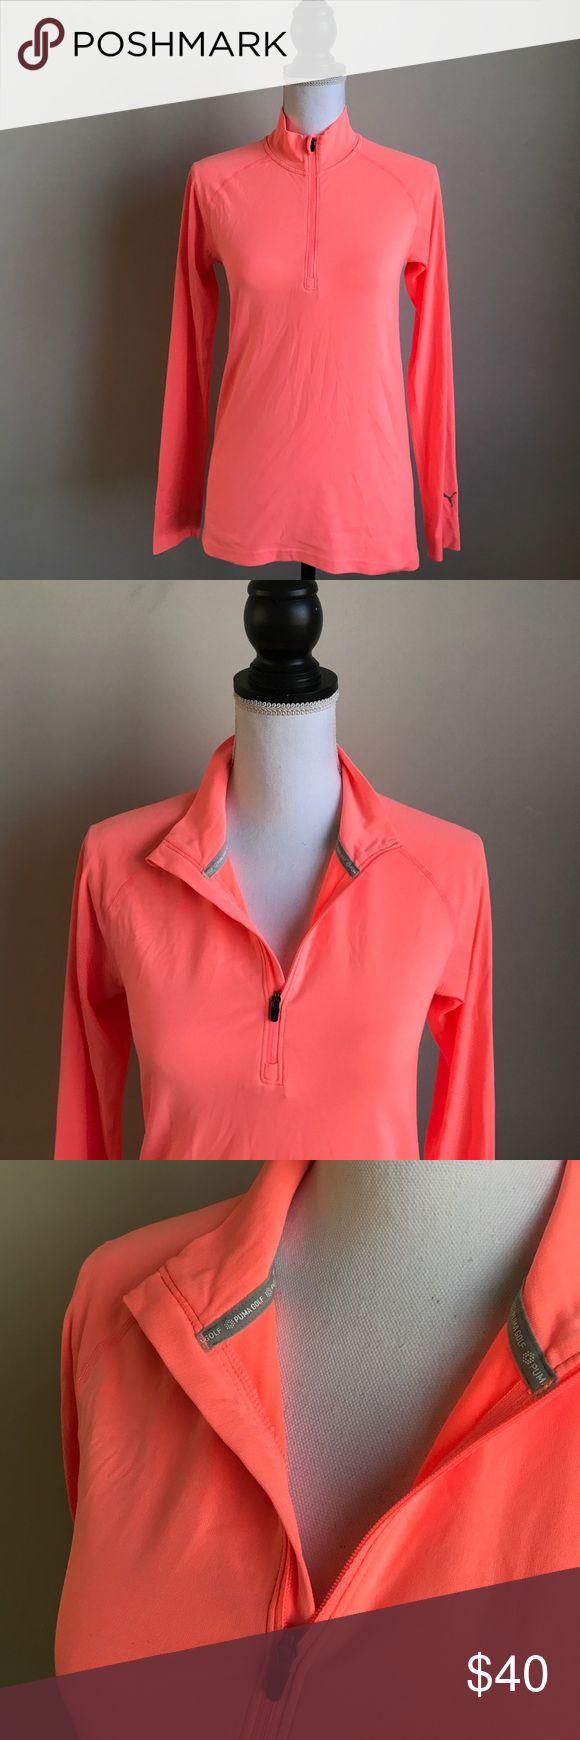 Puma coral long sleeve tee golf size Small 3/4 zip Puma women's golf shirt in beautiful bright coral color. Size Small. Long sleeves: 3/4 zip neck. Puma Tops Tees - Long Sleeve